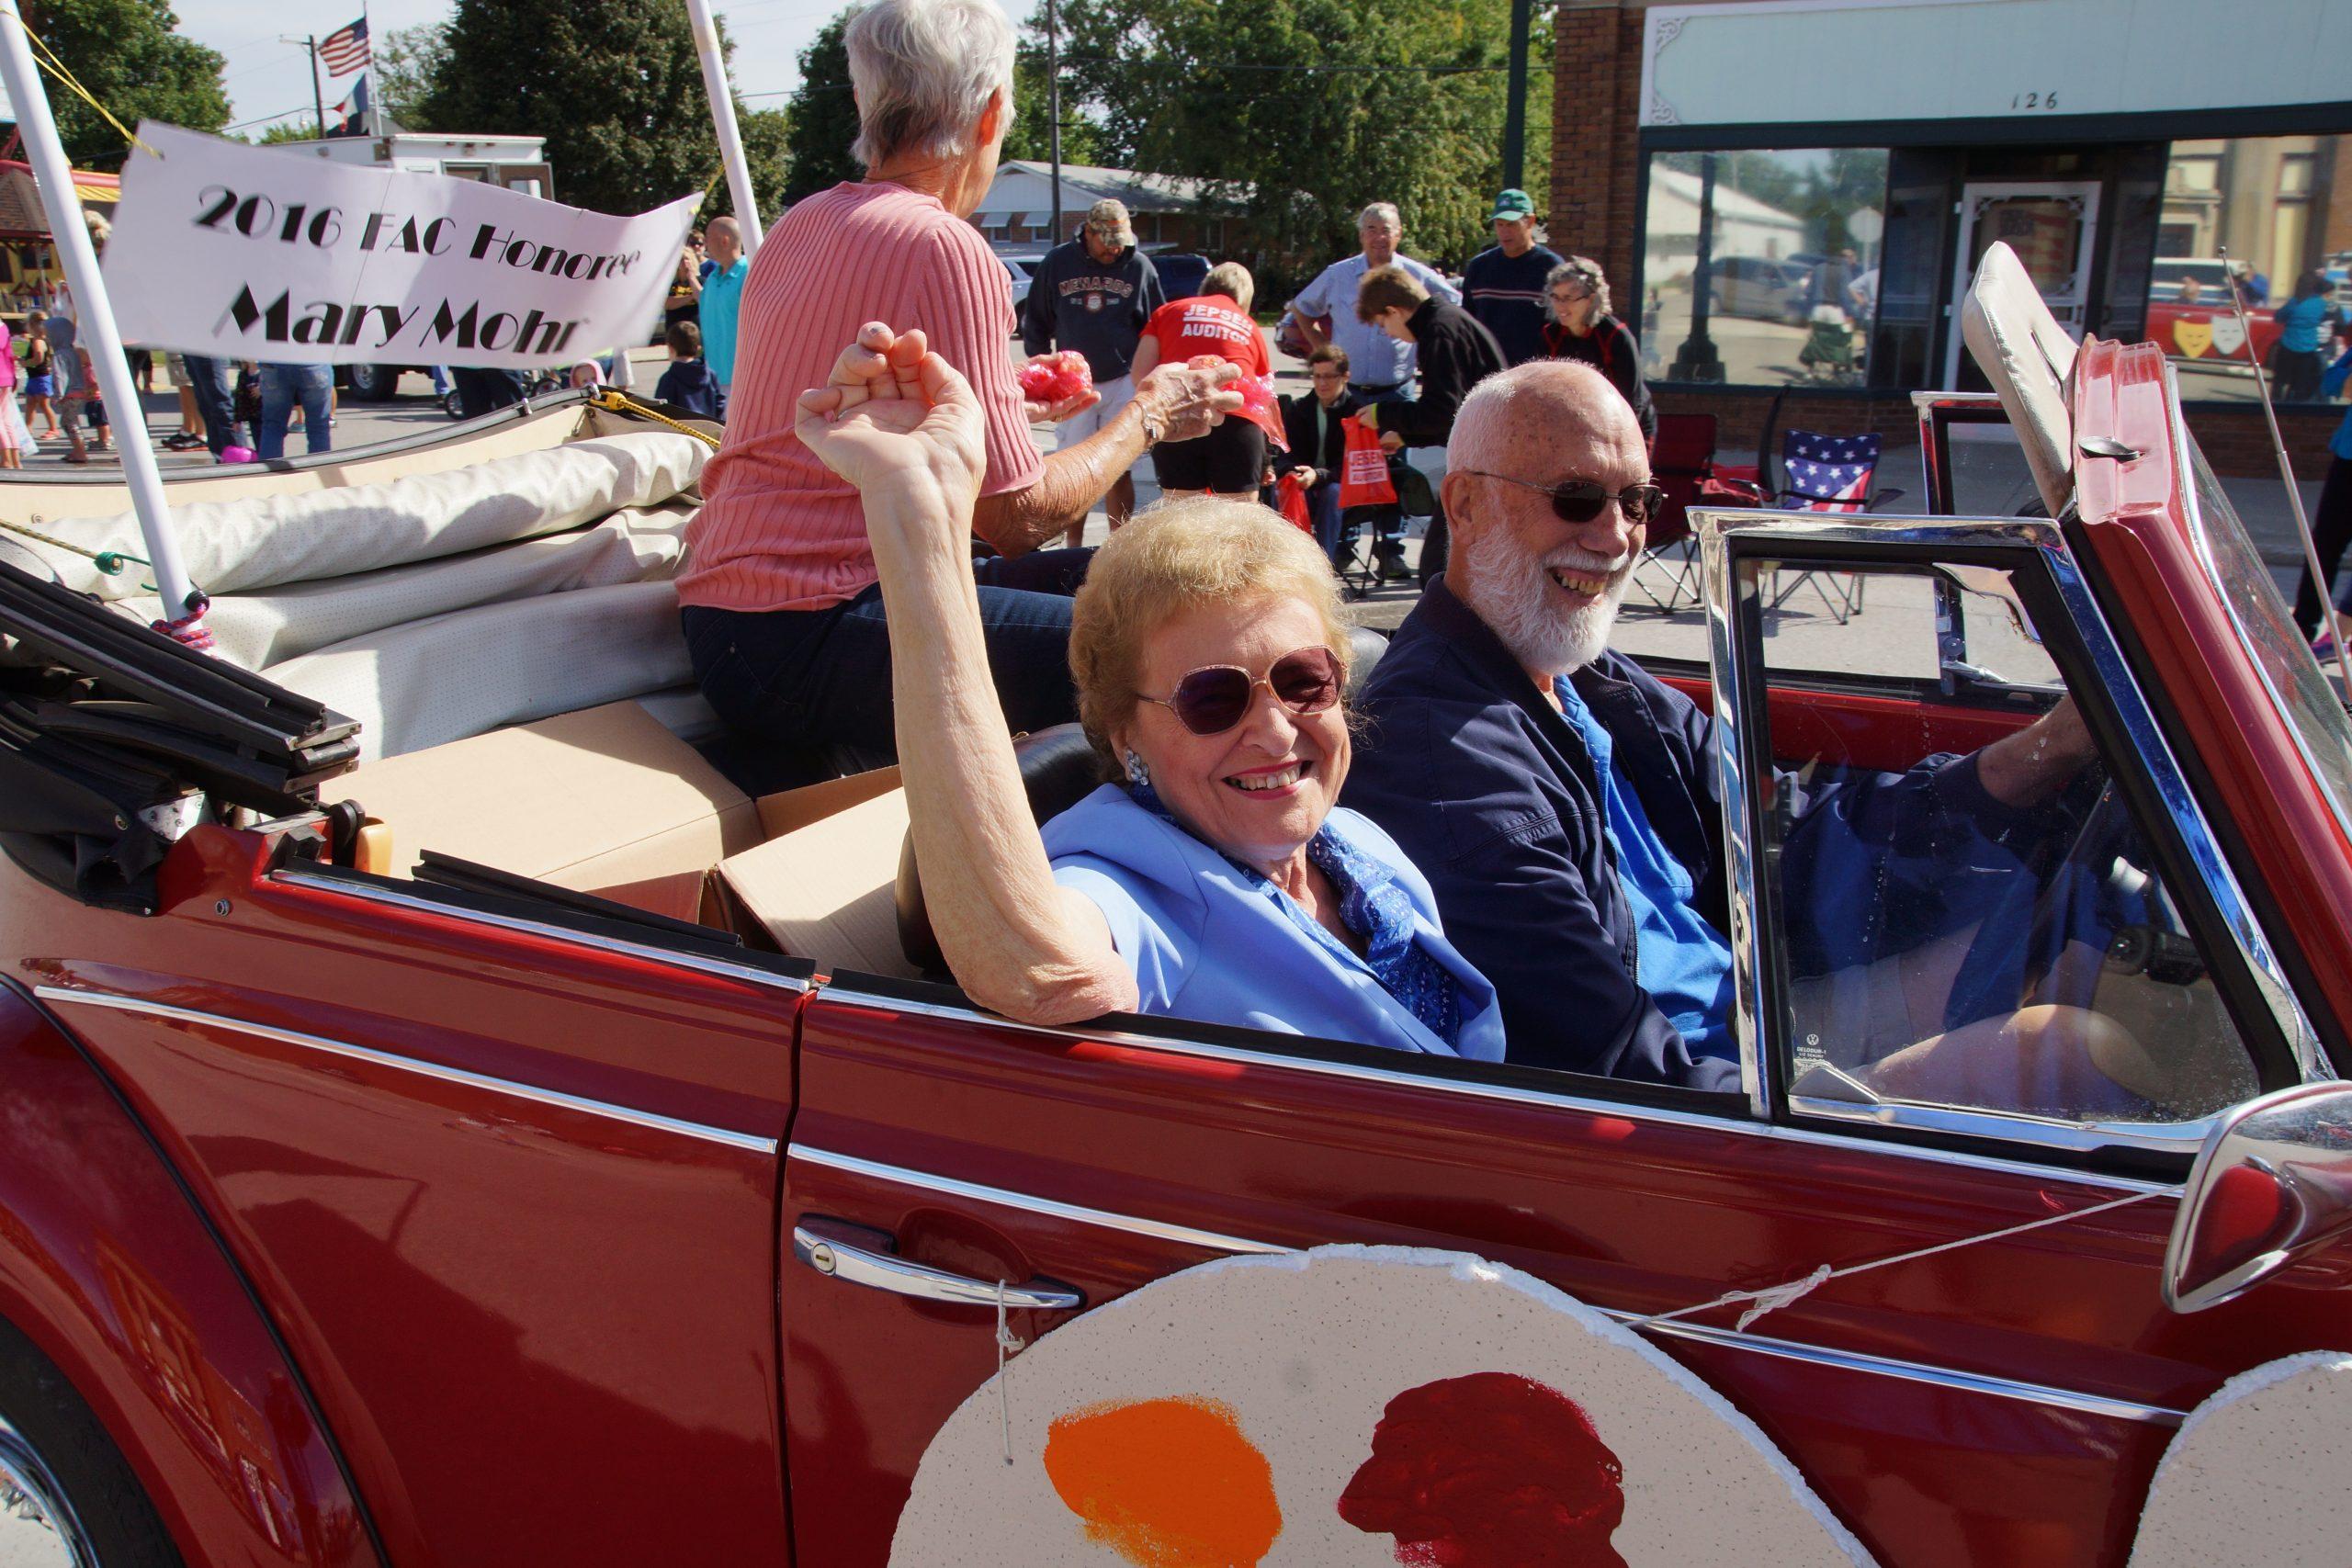 Grand Marshal Mary Mohr in Fonda Labor Day Parade 2016